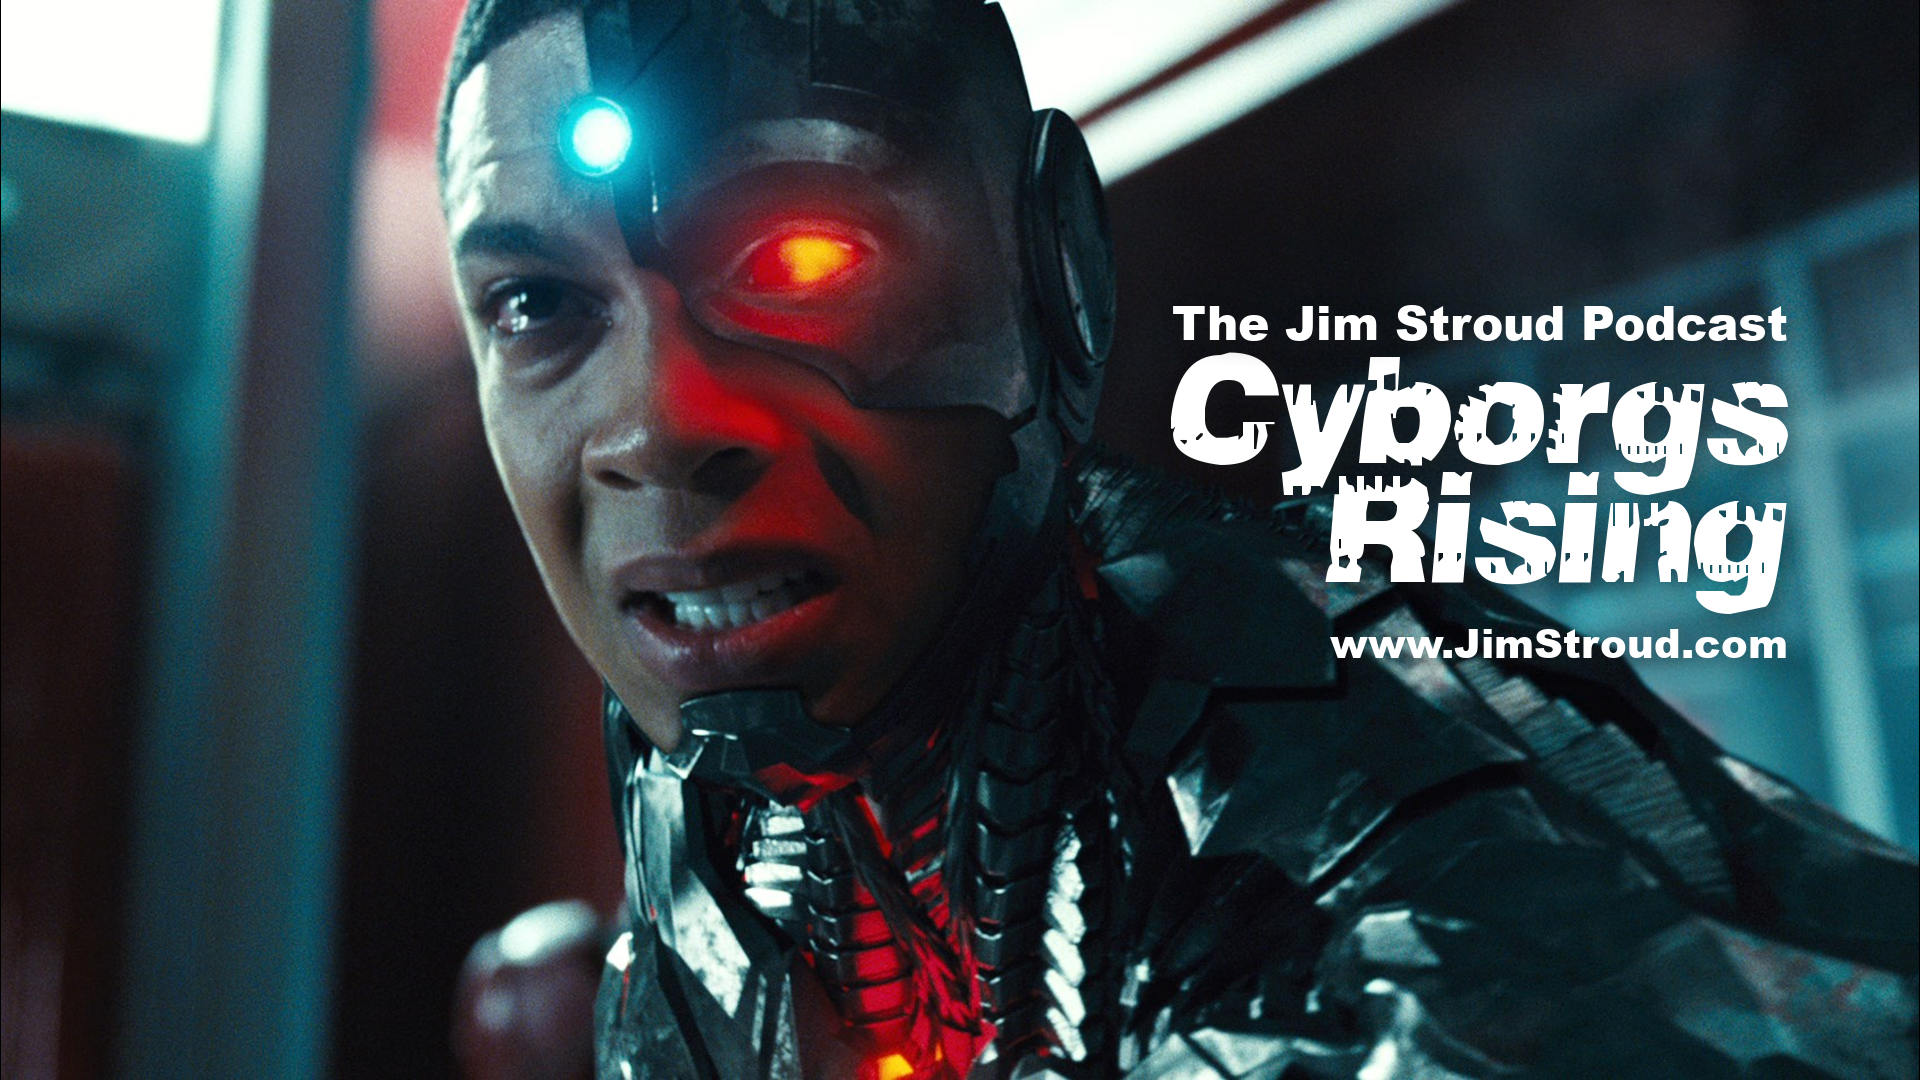 Cyborgs Rising